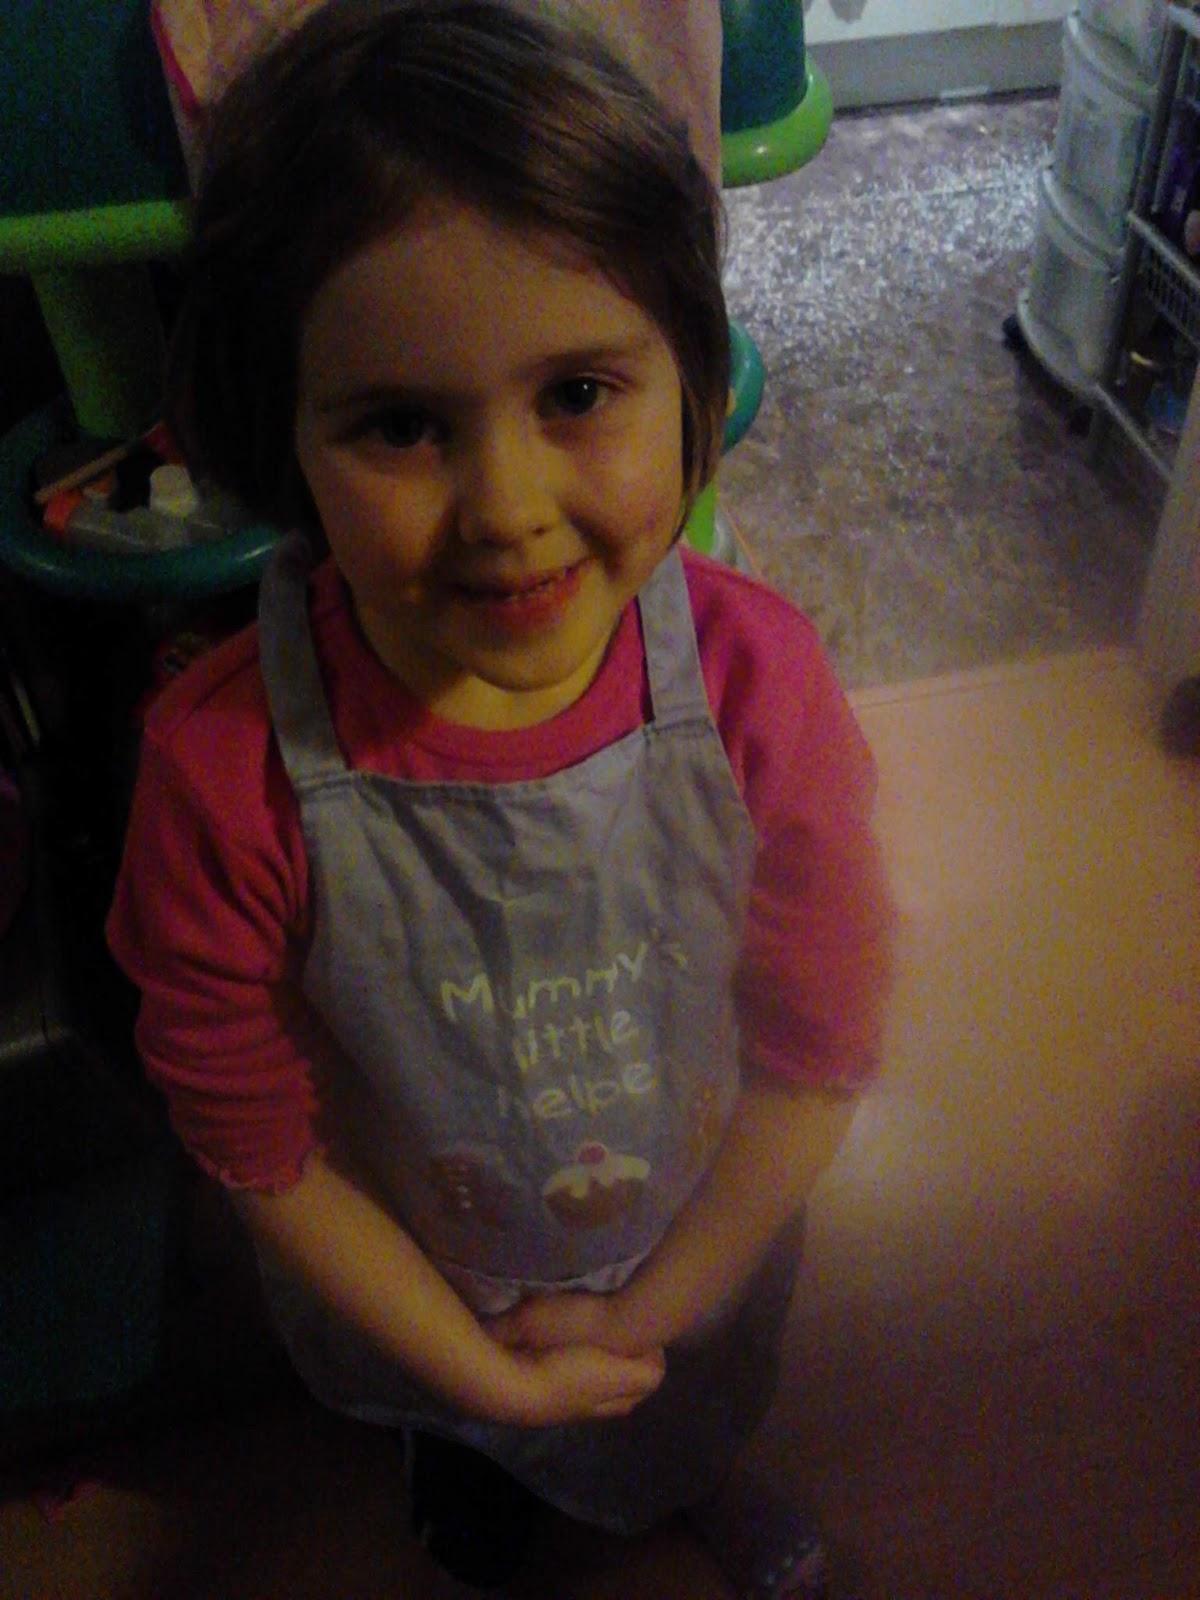 new*new*11yo pthc 5yo ready to help with baking